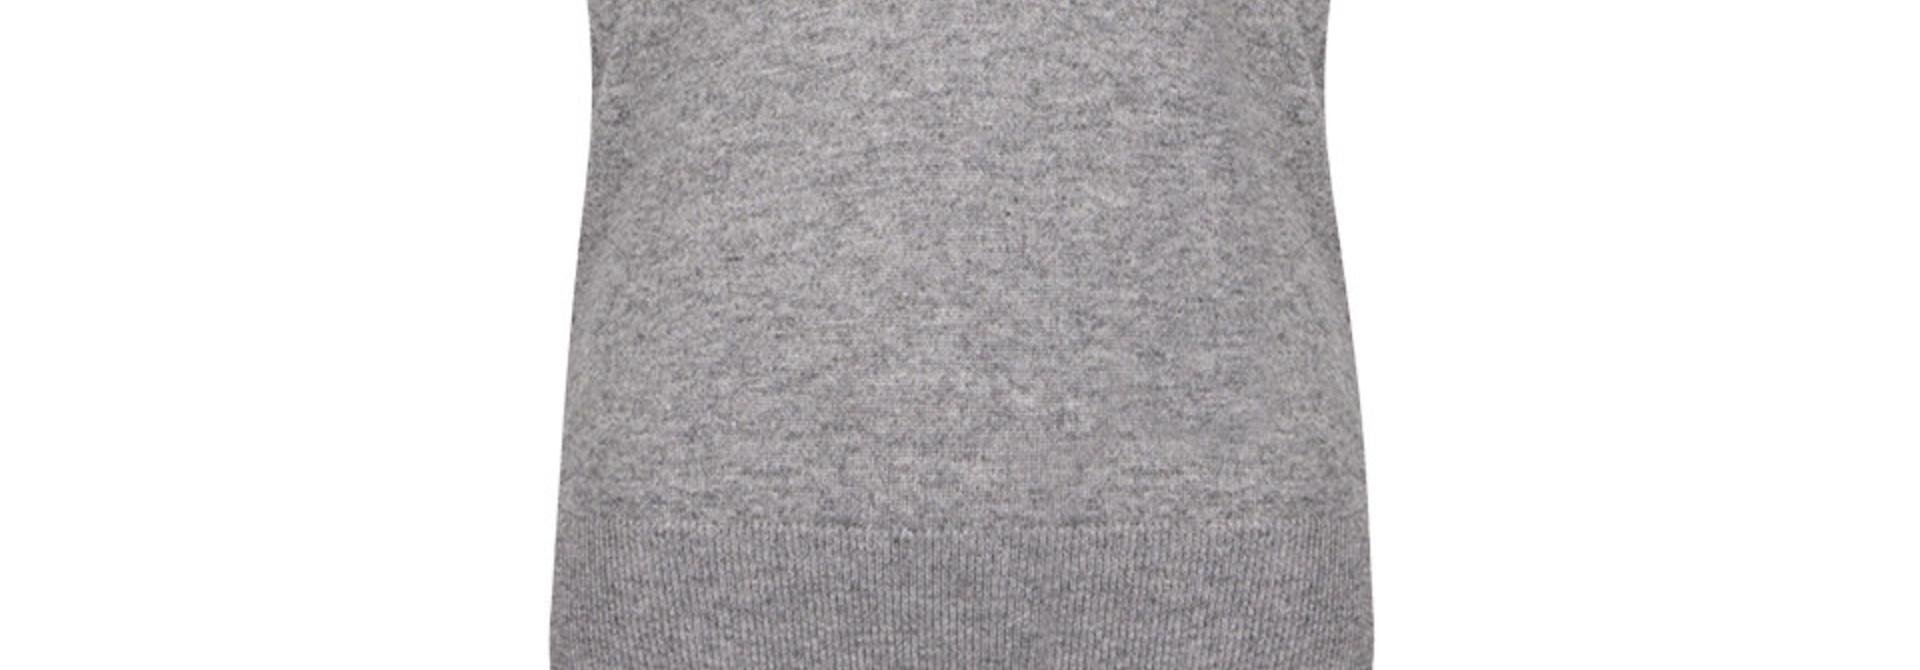 talou spencer heather grey